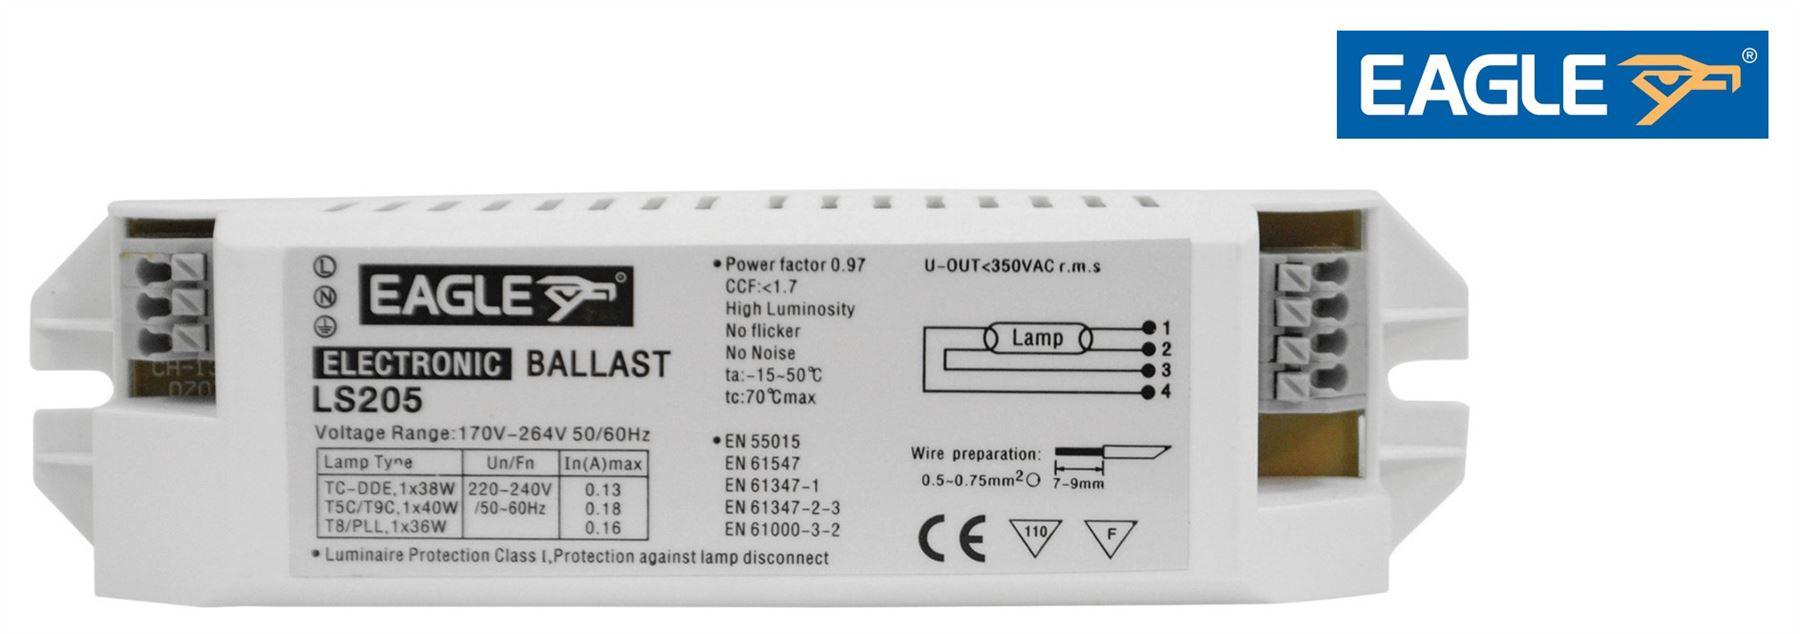 Eagle Electronic Ballast 40/38/36W 5021196644798 | eBay